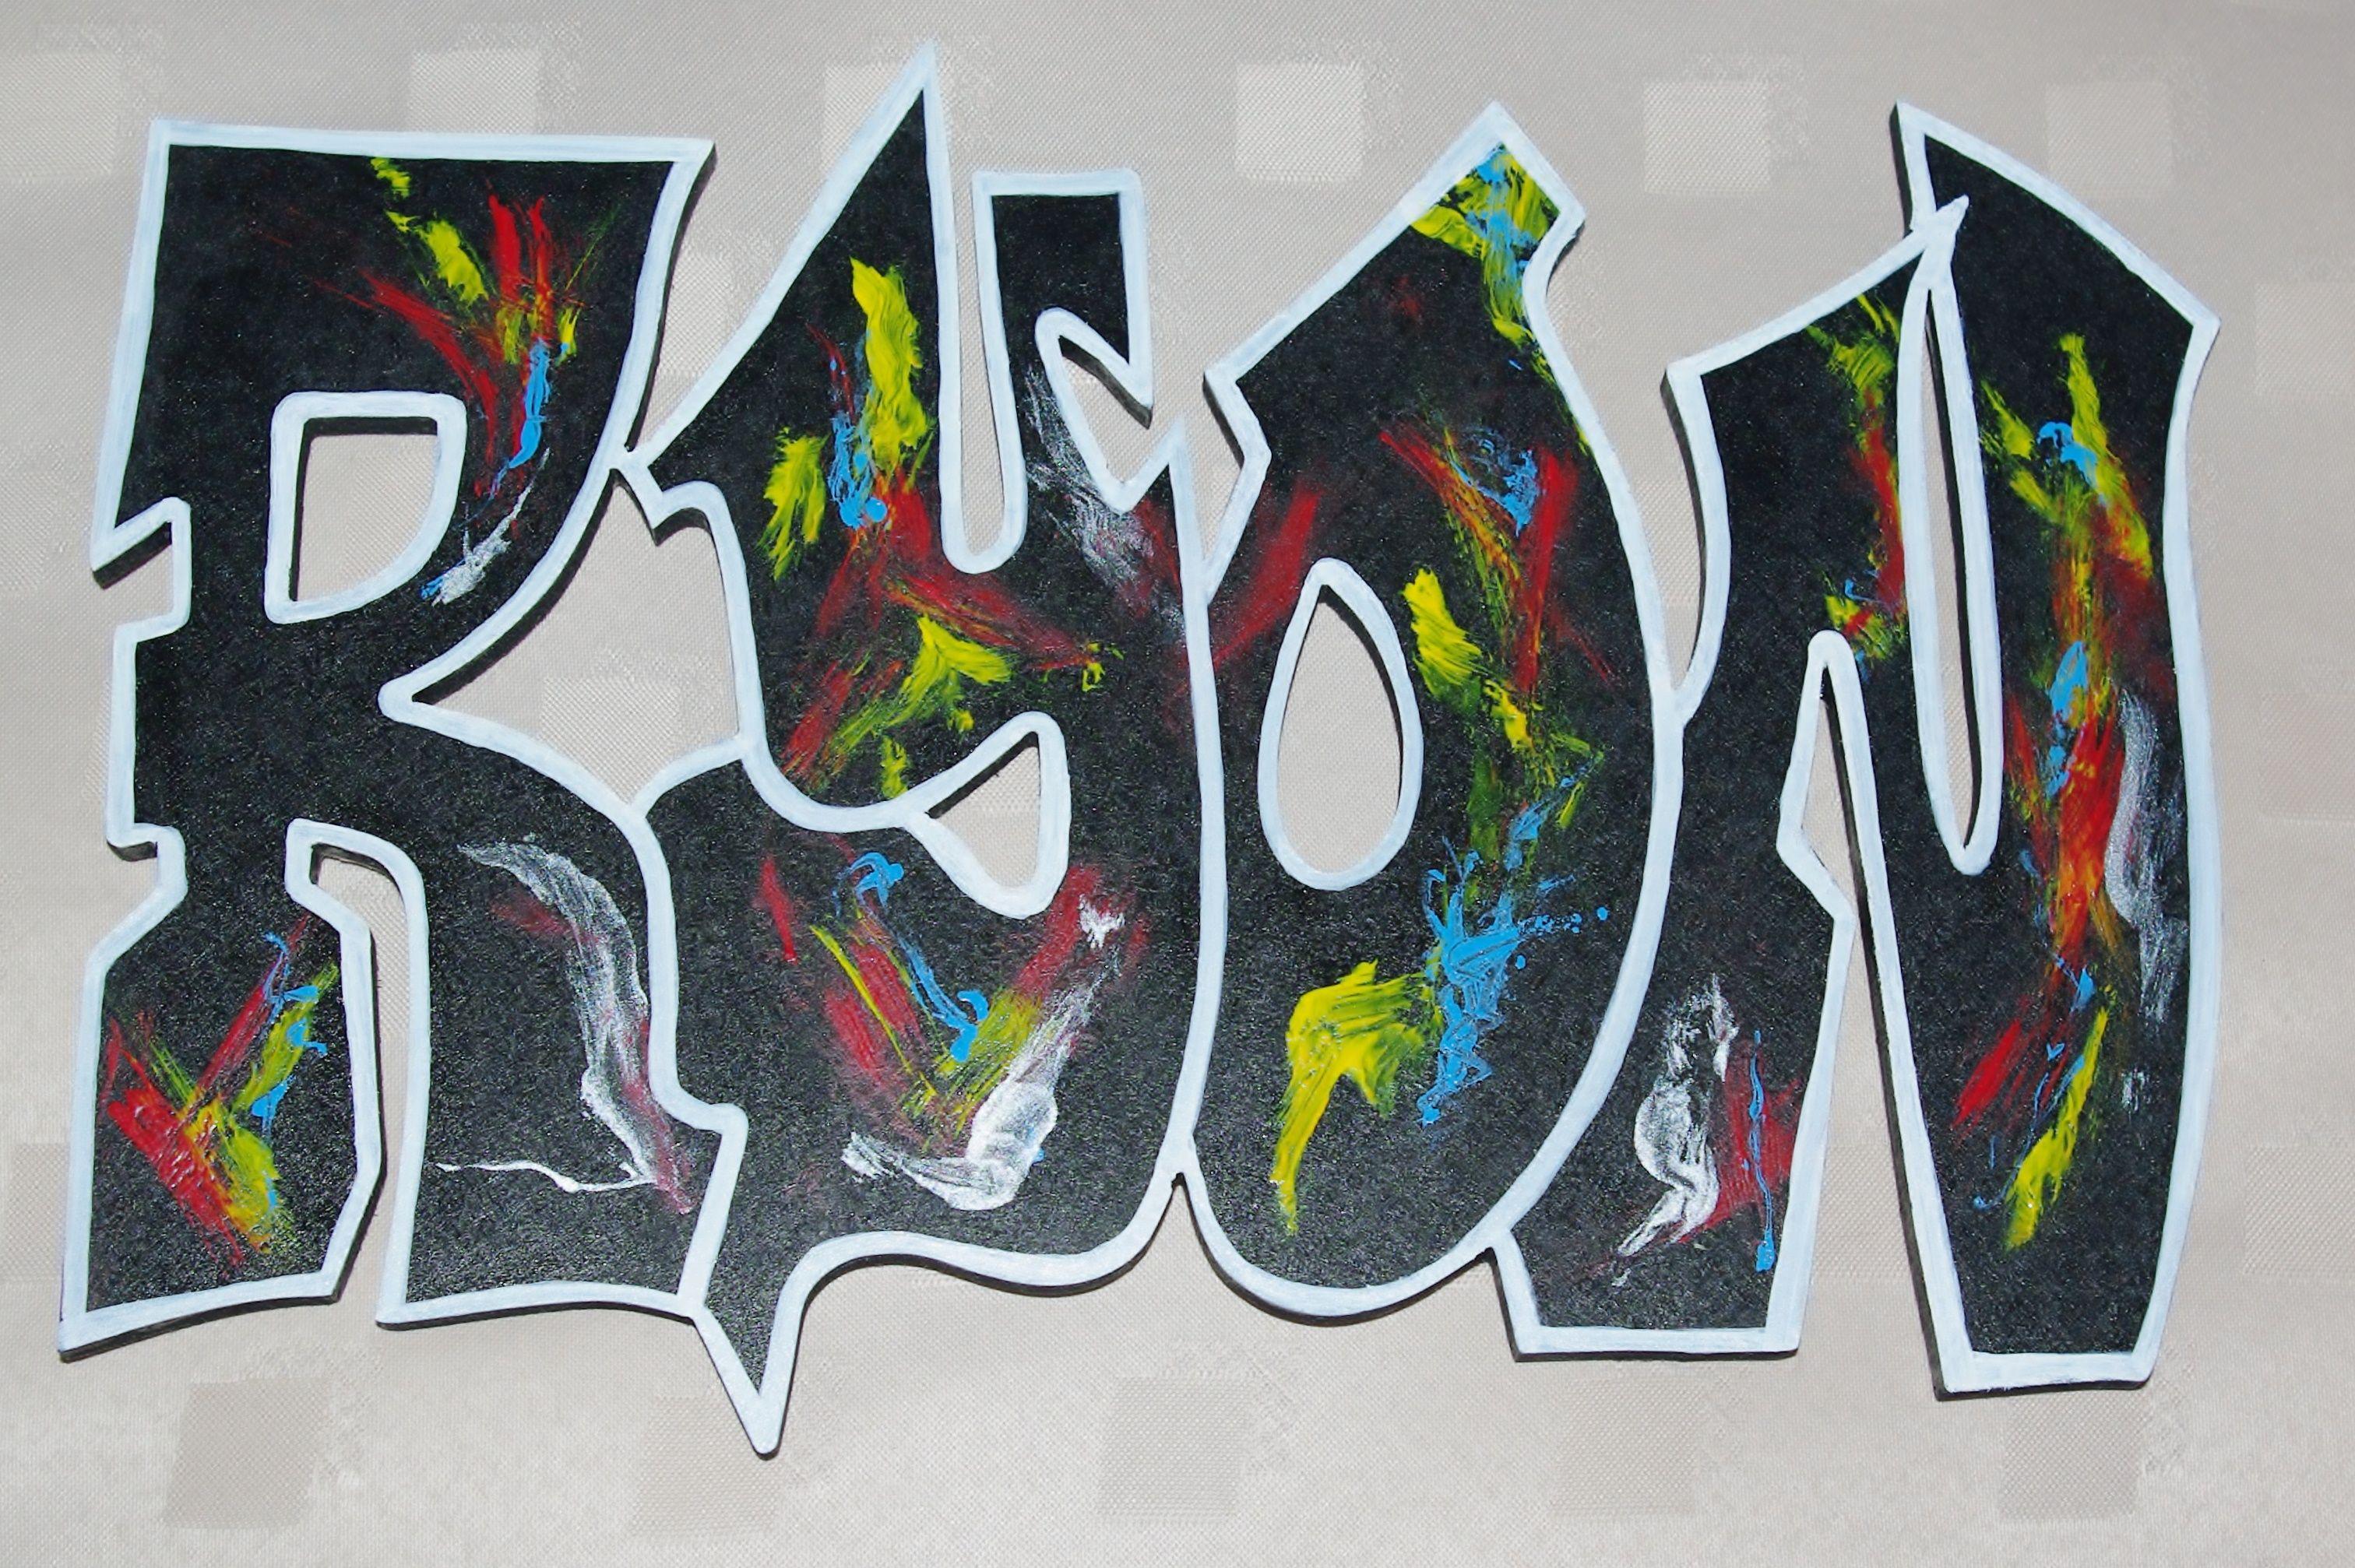 Graffiti art on wood - Wood Art Graffiti Name Plaque